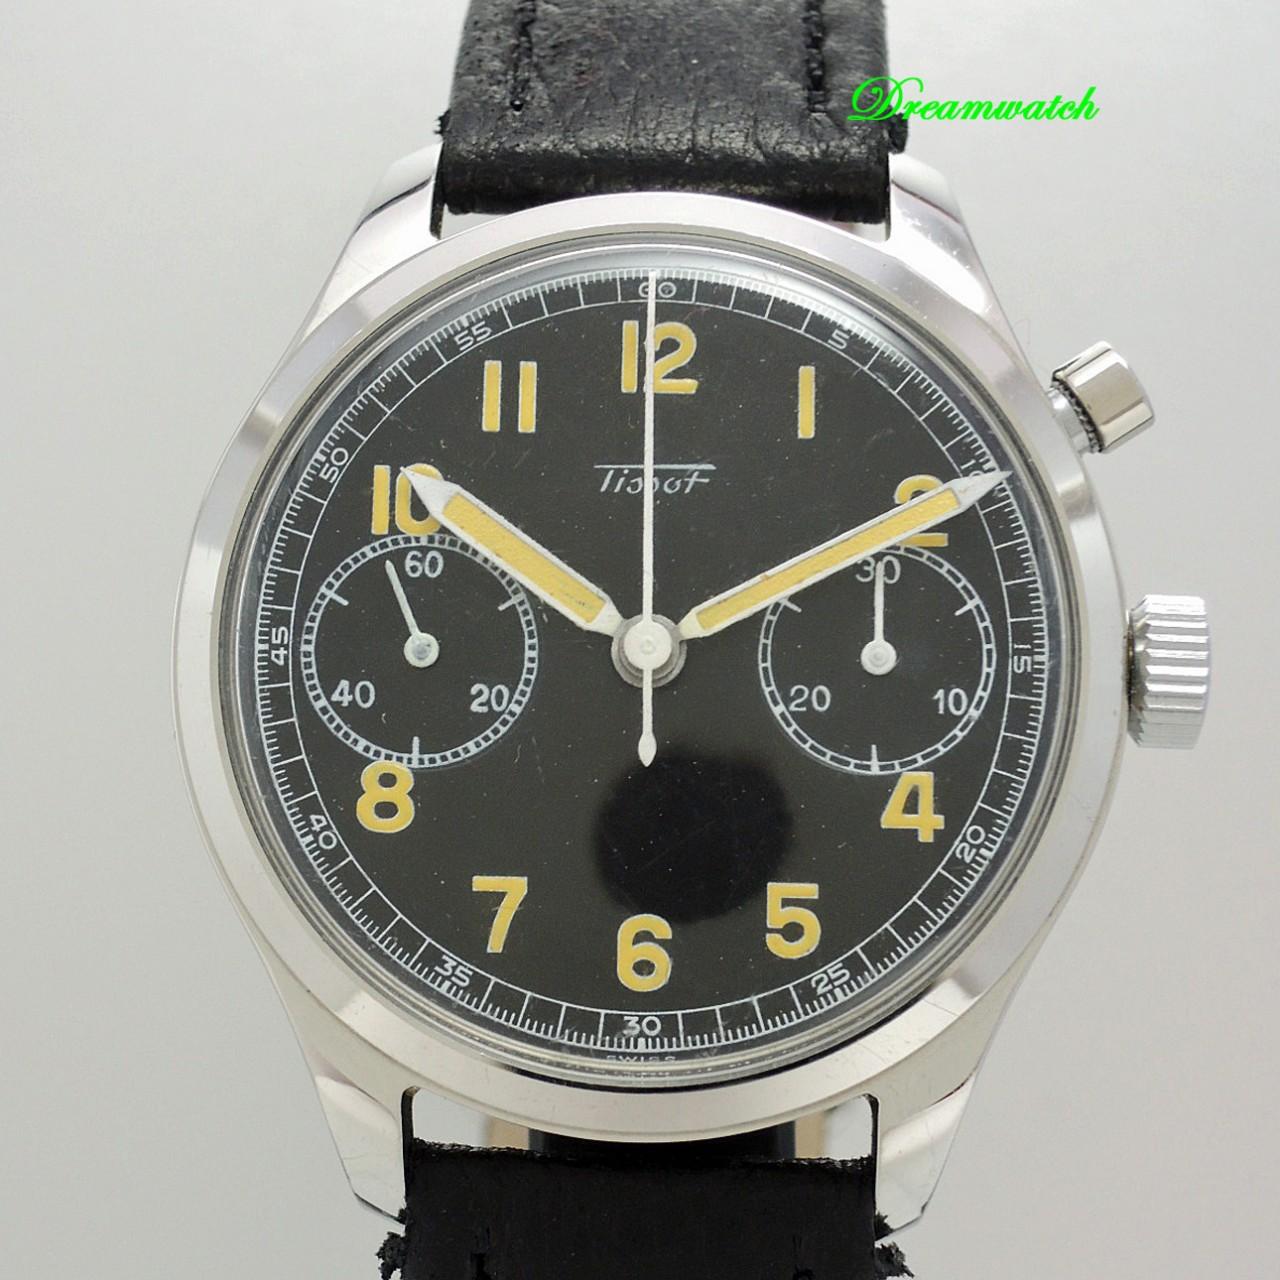 Tissot Monopusher Military Vintage Chronograph